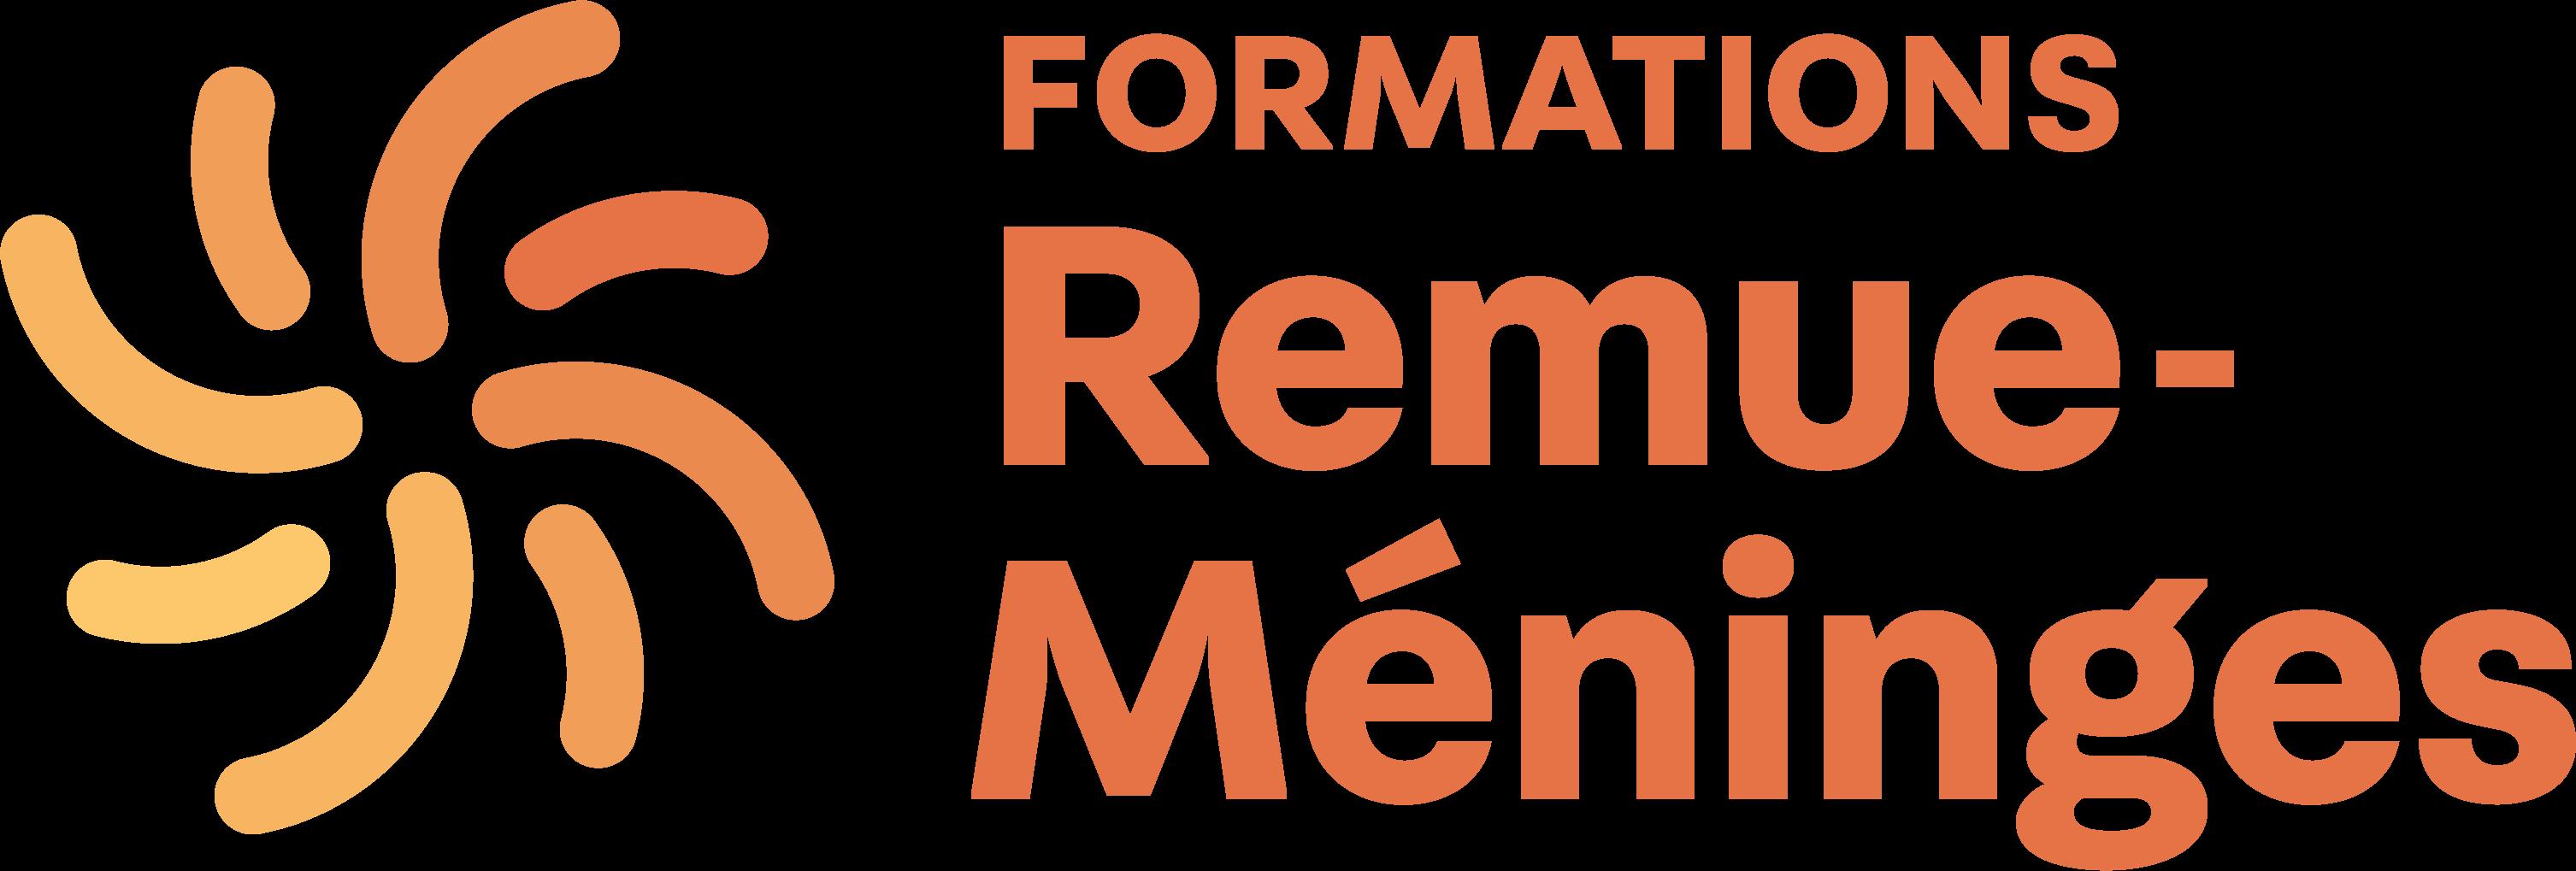 ACQ Remue Meninges Logo CMYK